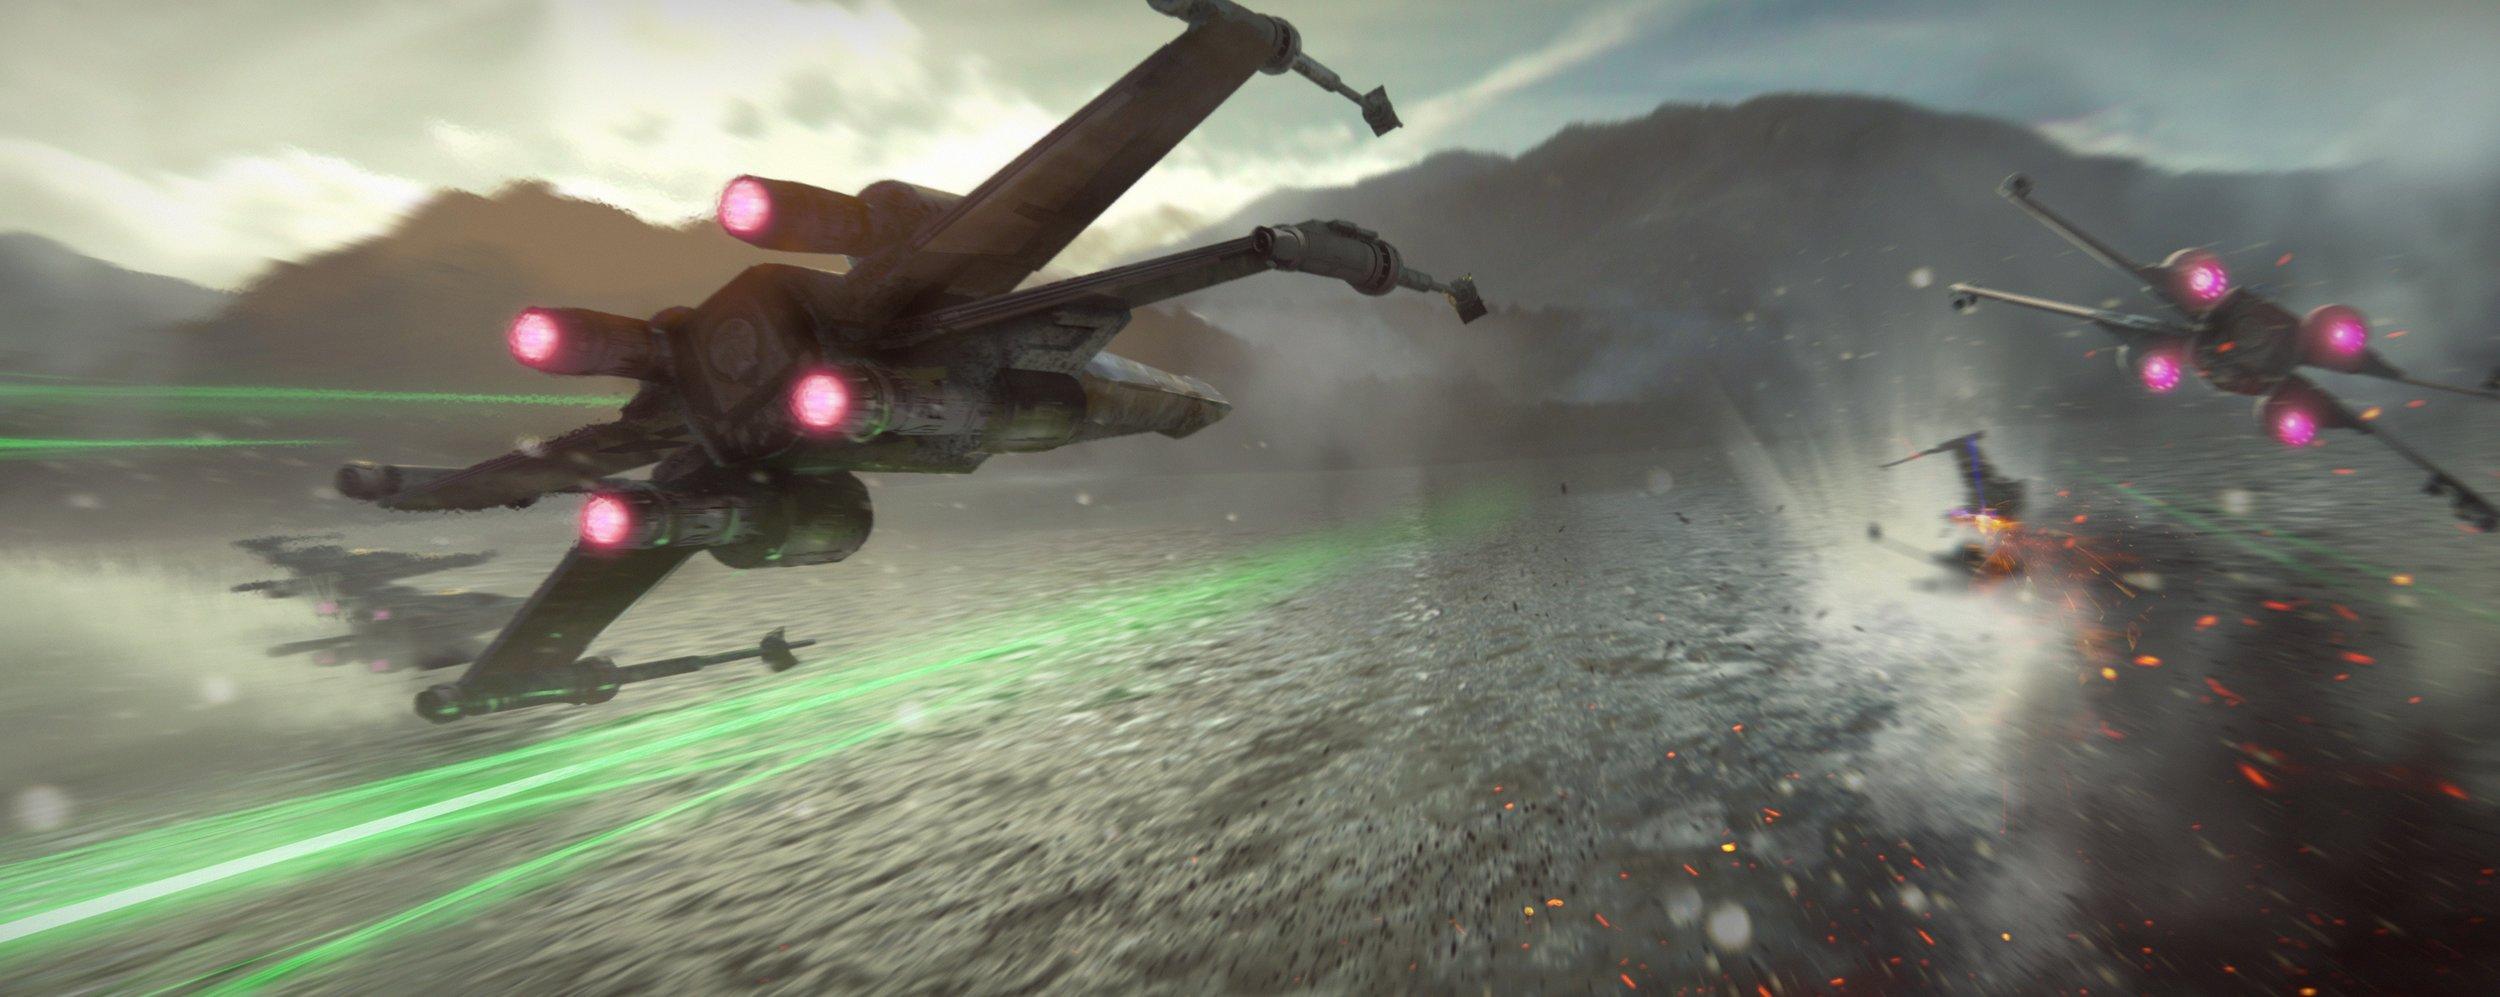 x-wing-starfighter-star-wars-7026